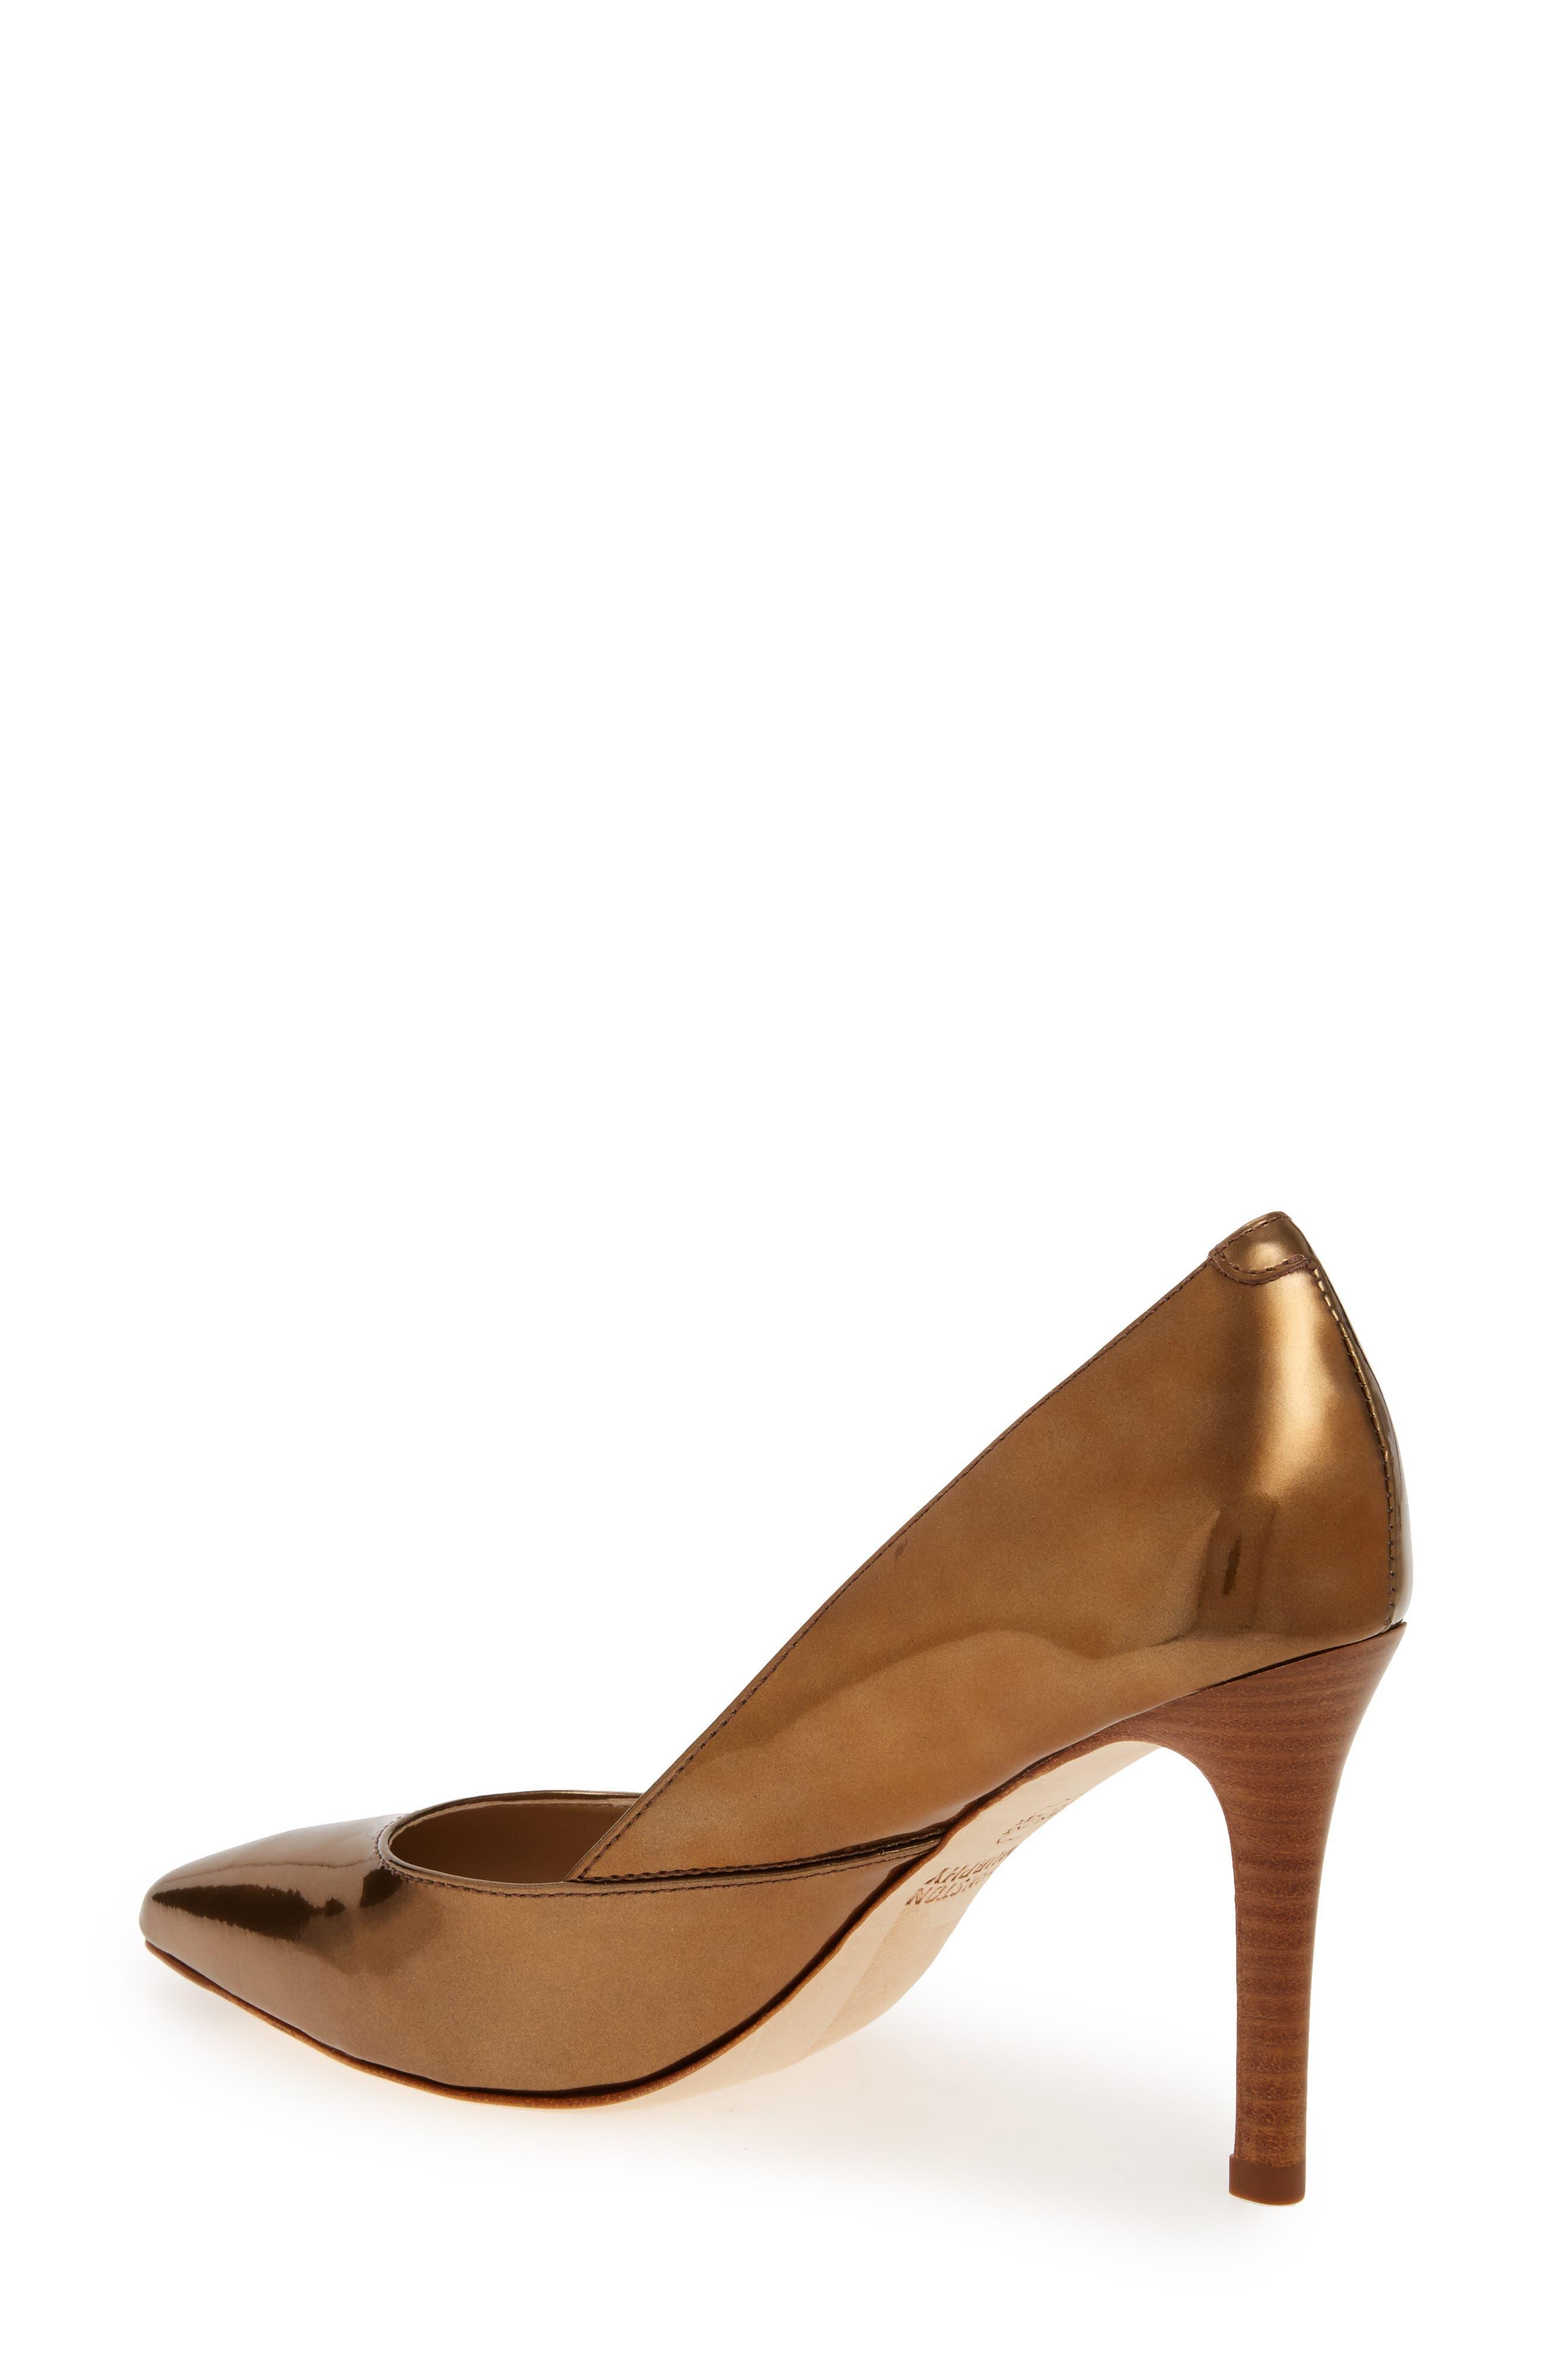 Alternate Image 2  - Johnston & Murphy 'Vanessa' Pointy Toe Leather Pump (Women)